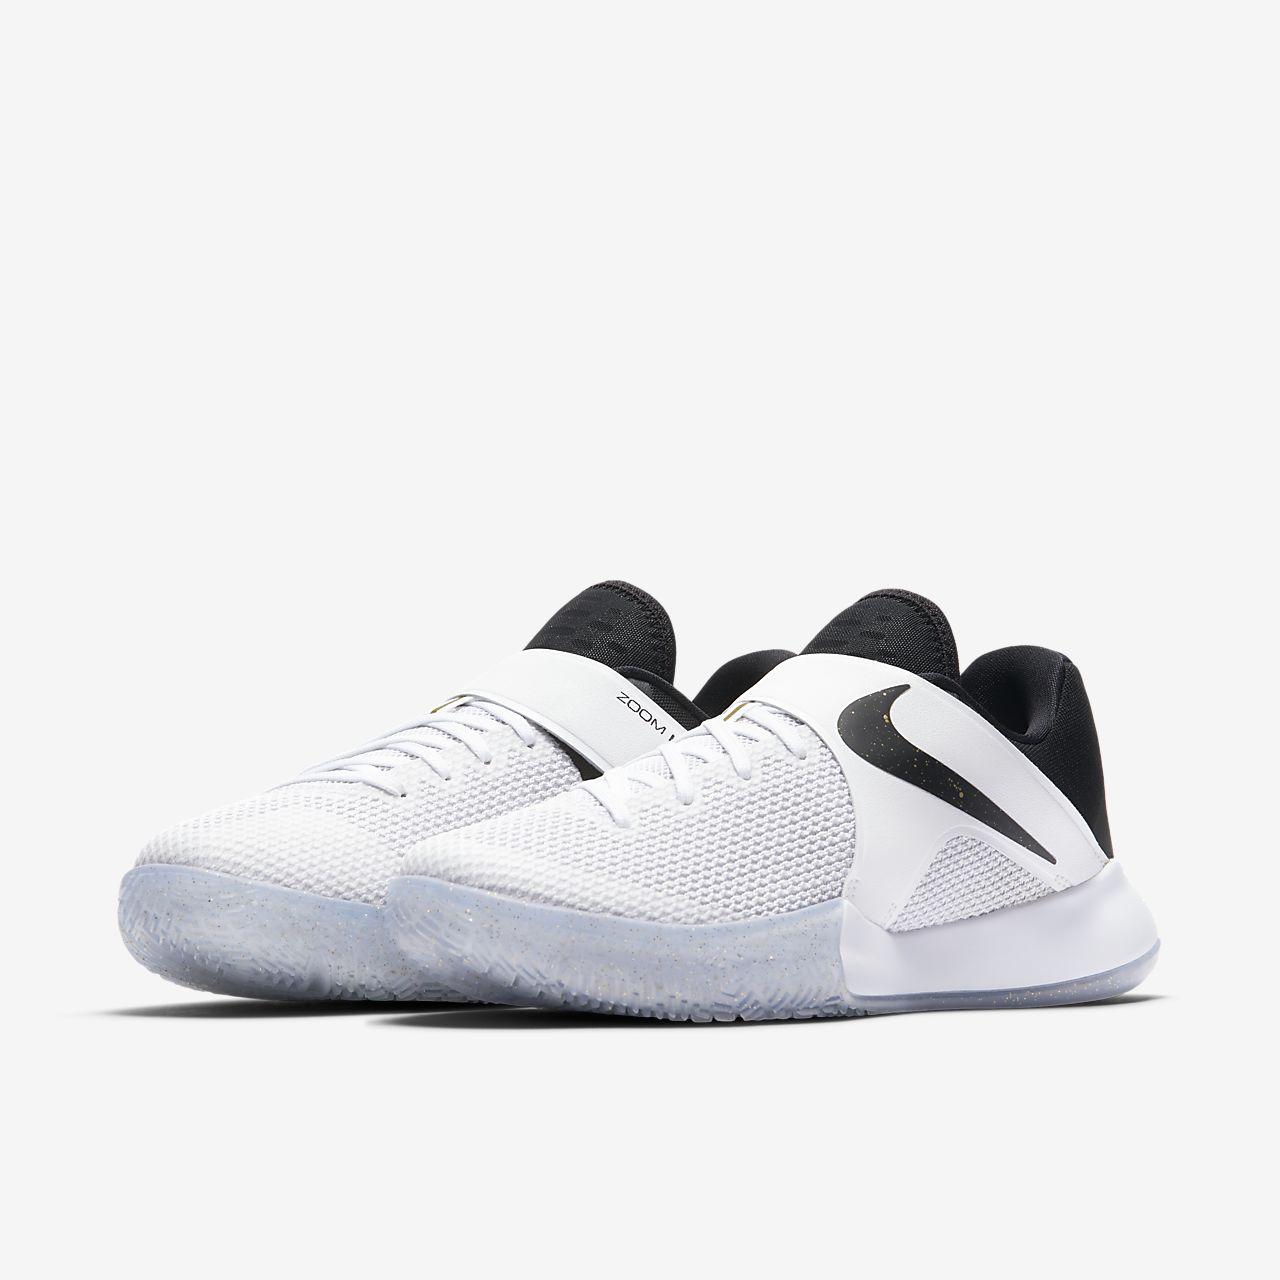 ... Nike Zoom Live Women's Basketball Shoe